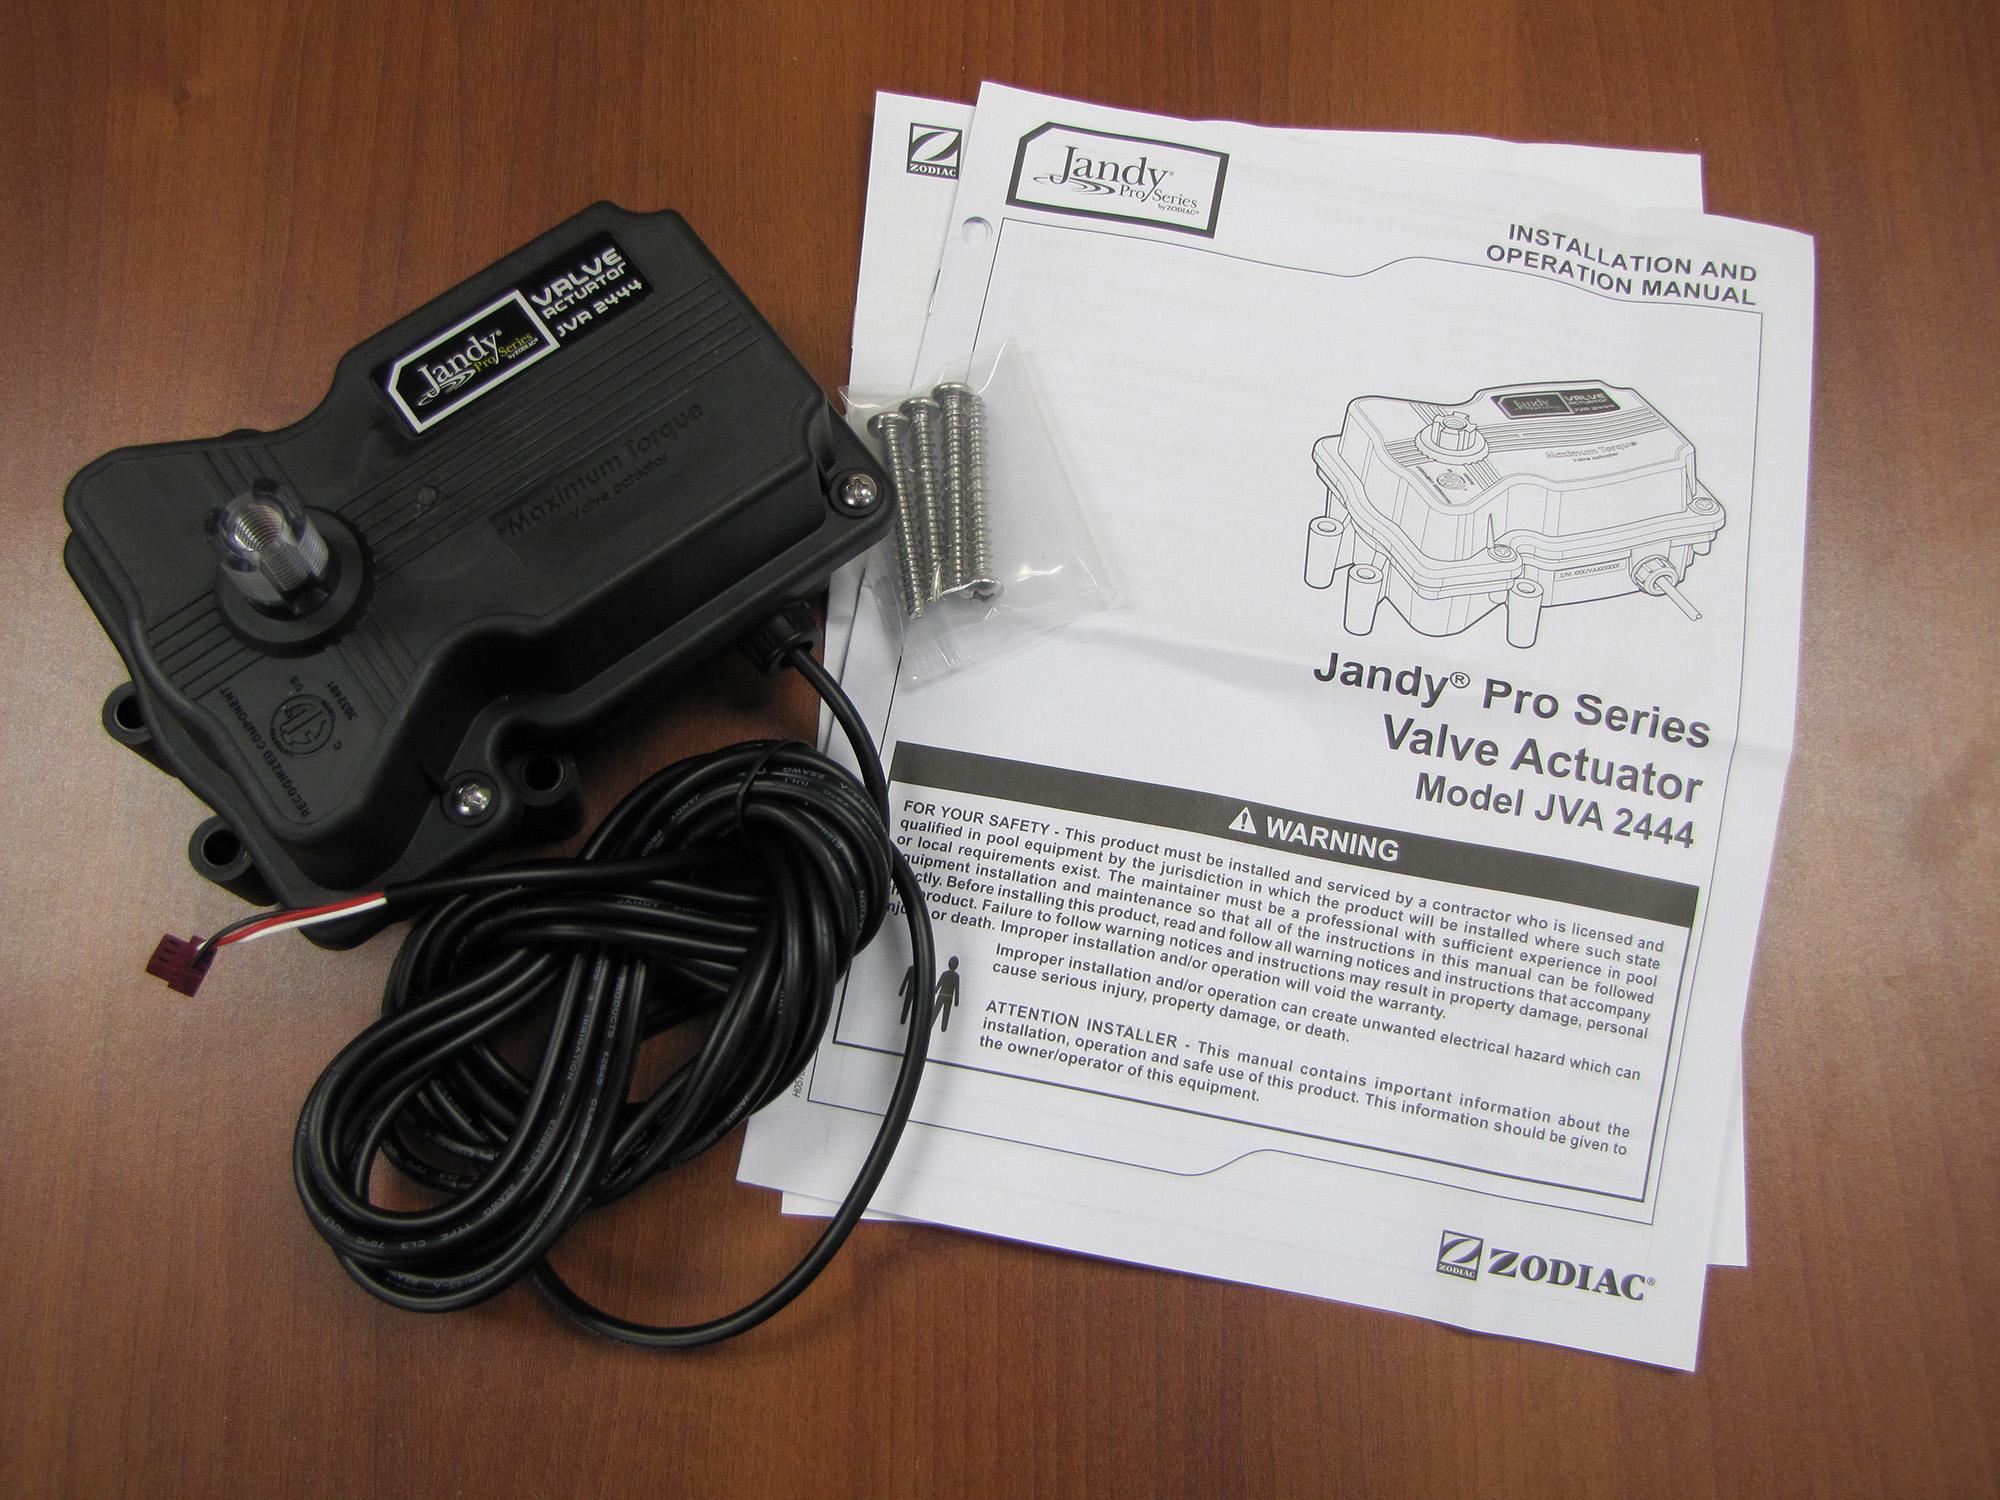 Jandy Valve Actuator Installation And Operation Manual Nemetas Wiring Diagram 5